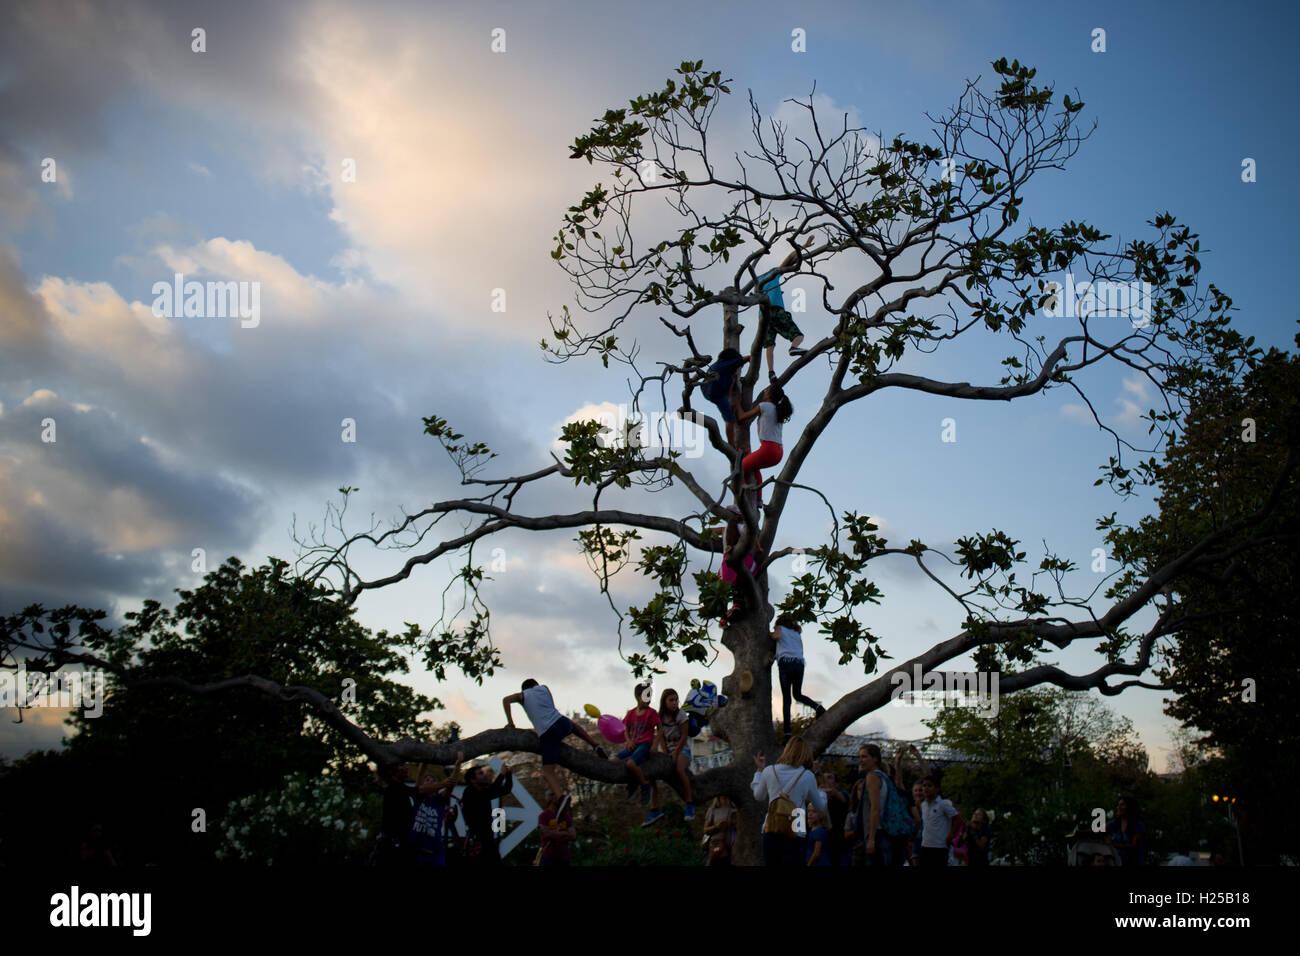 Barcelone, Catalogne, Espagne. Sep 24, 2016. Les enfants bénéficient d'un arbre d'escalade au Parc de la Ciutadella de Barcelone. © Jordi Boixareu/ZUMA/Alamy Fil Live News Banque D'Images